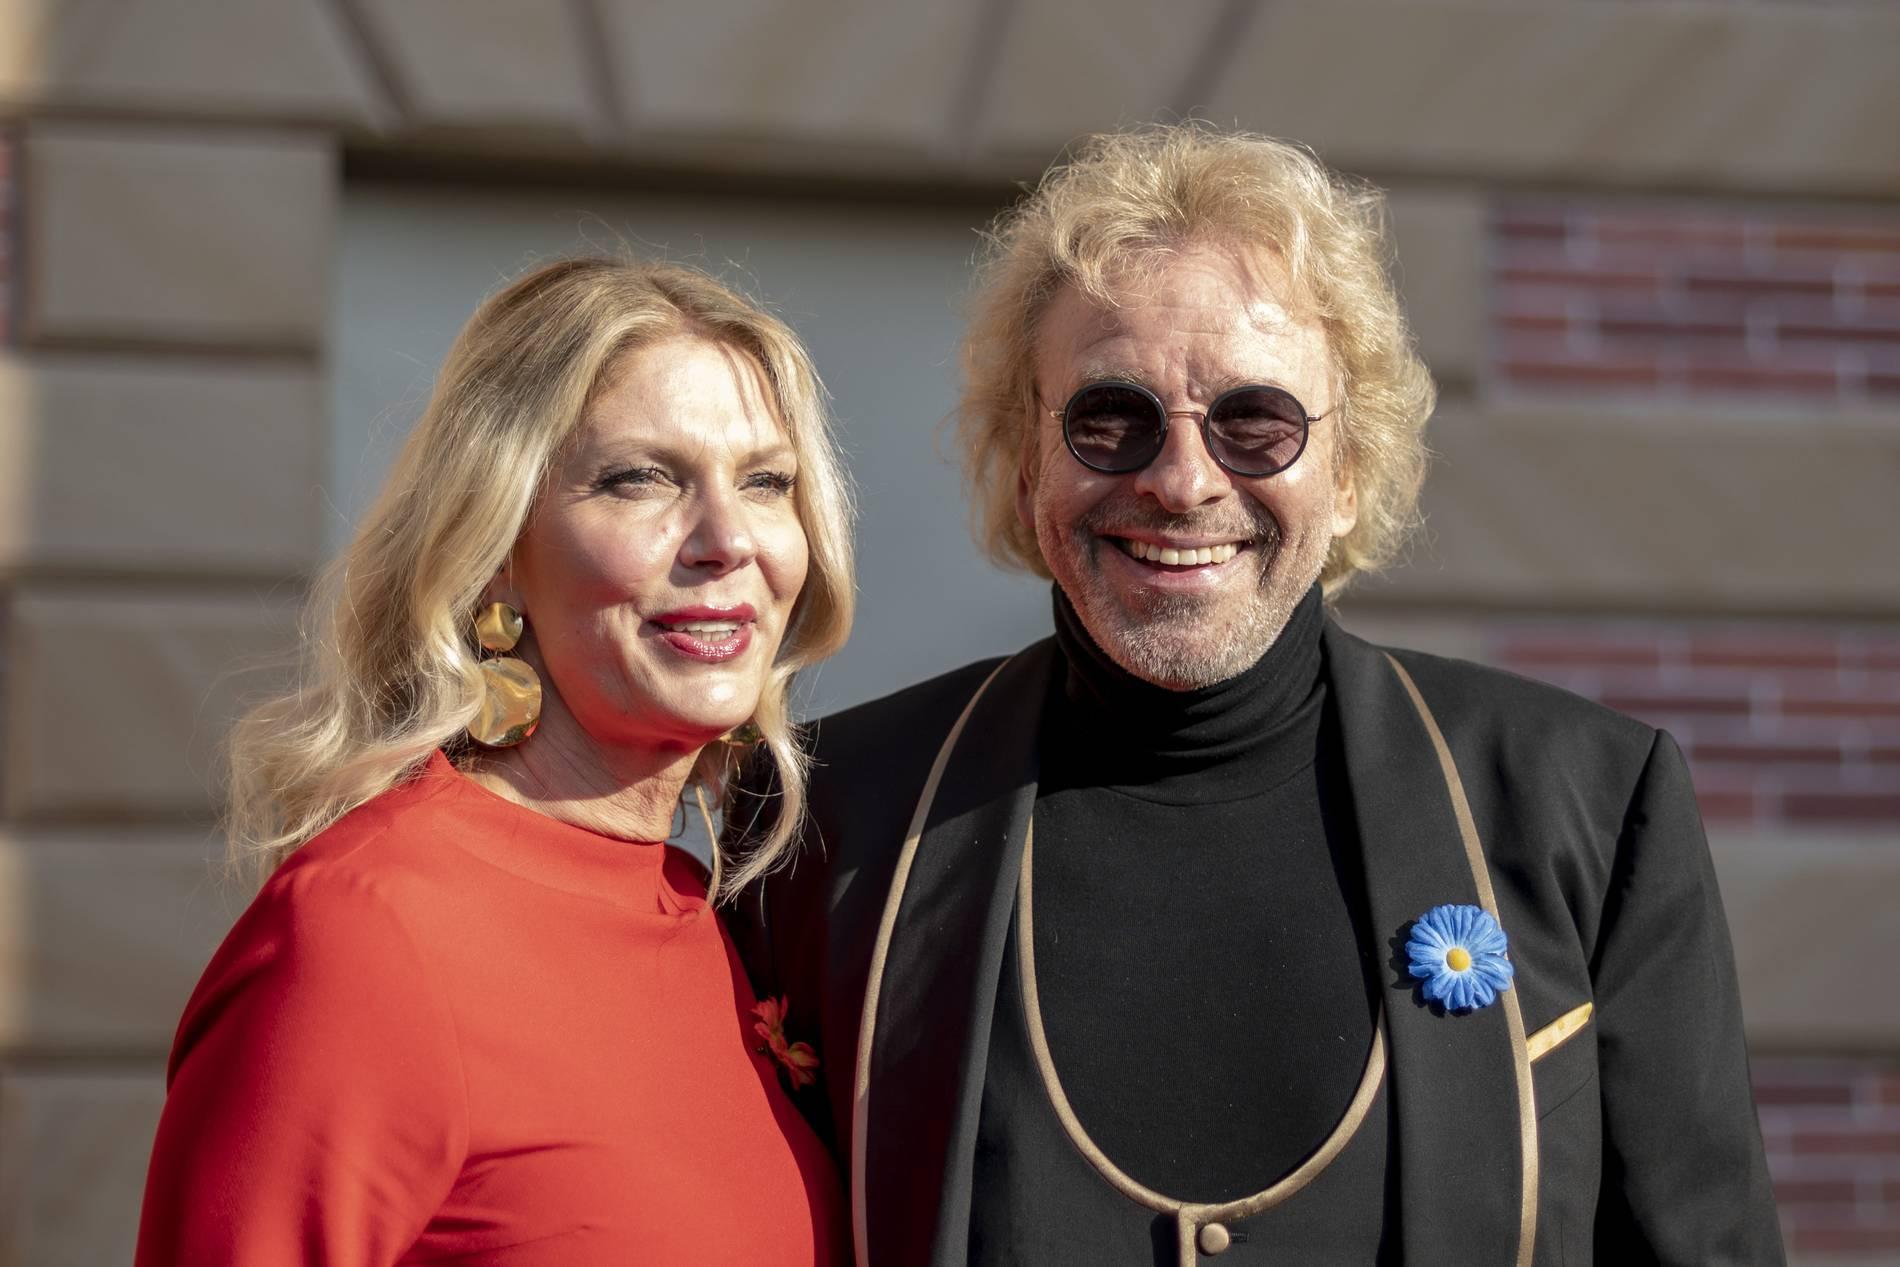 Thomas Gottschalk mit Freundin im Europa-Park - er kritisiert Influencer | Stars